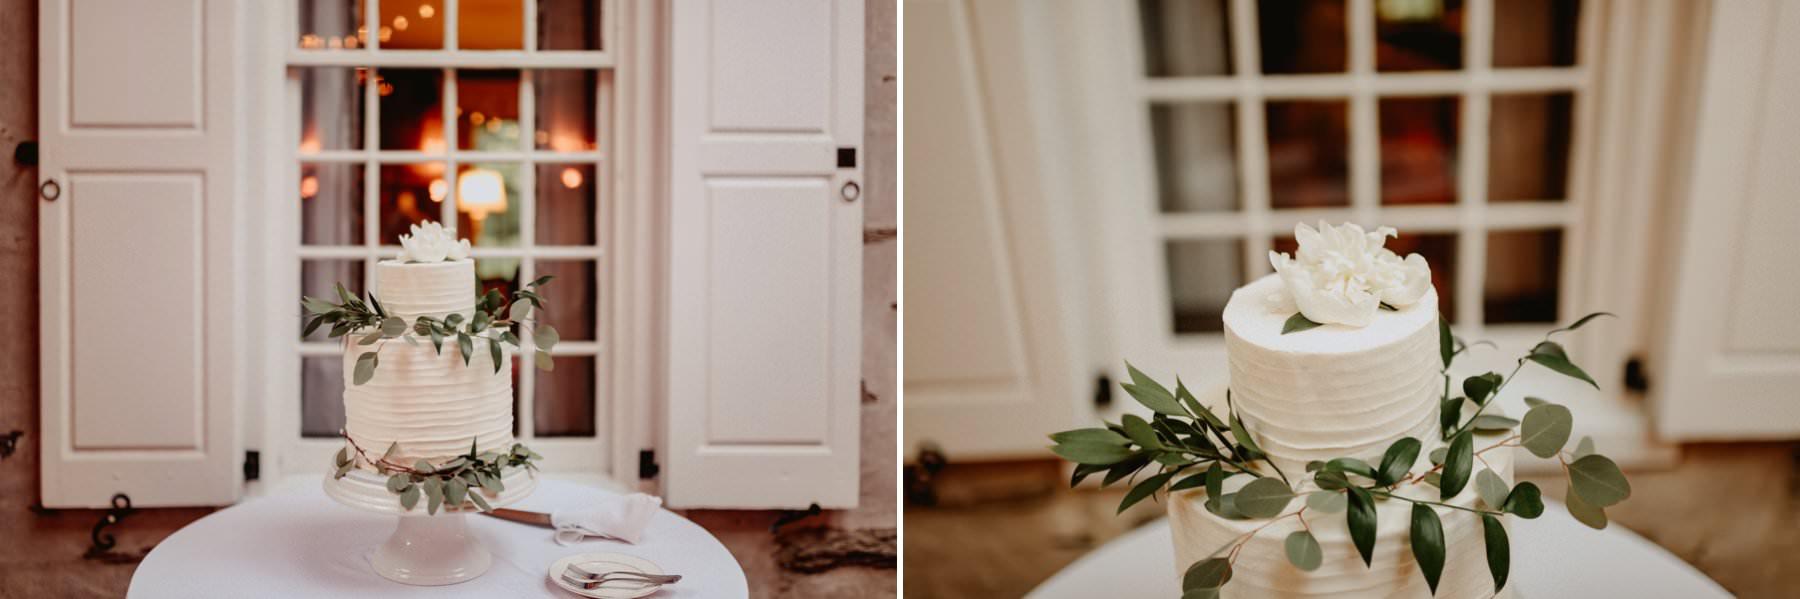 Appleford-estate-wedding-126.jpg